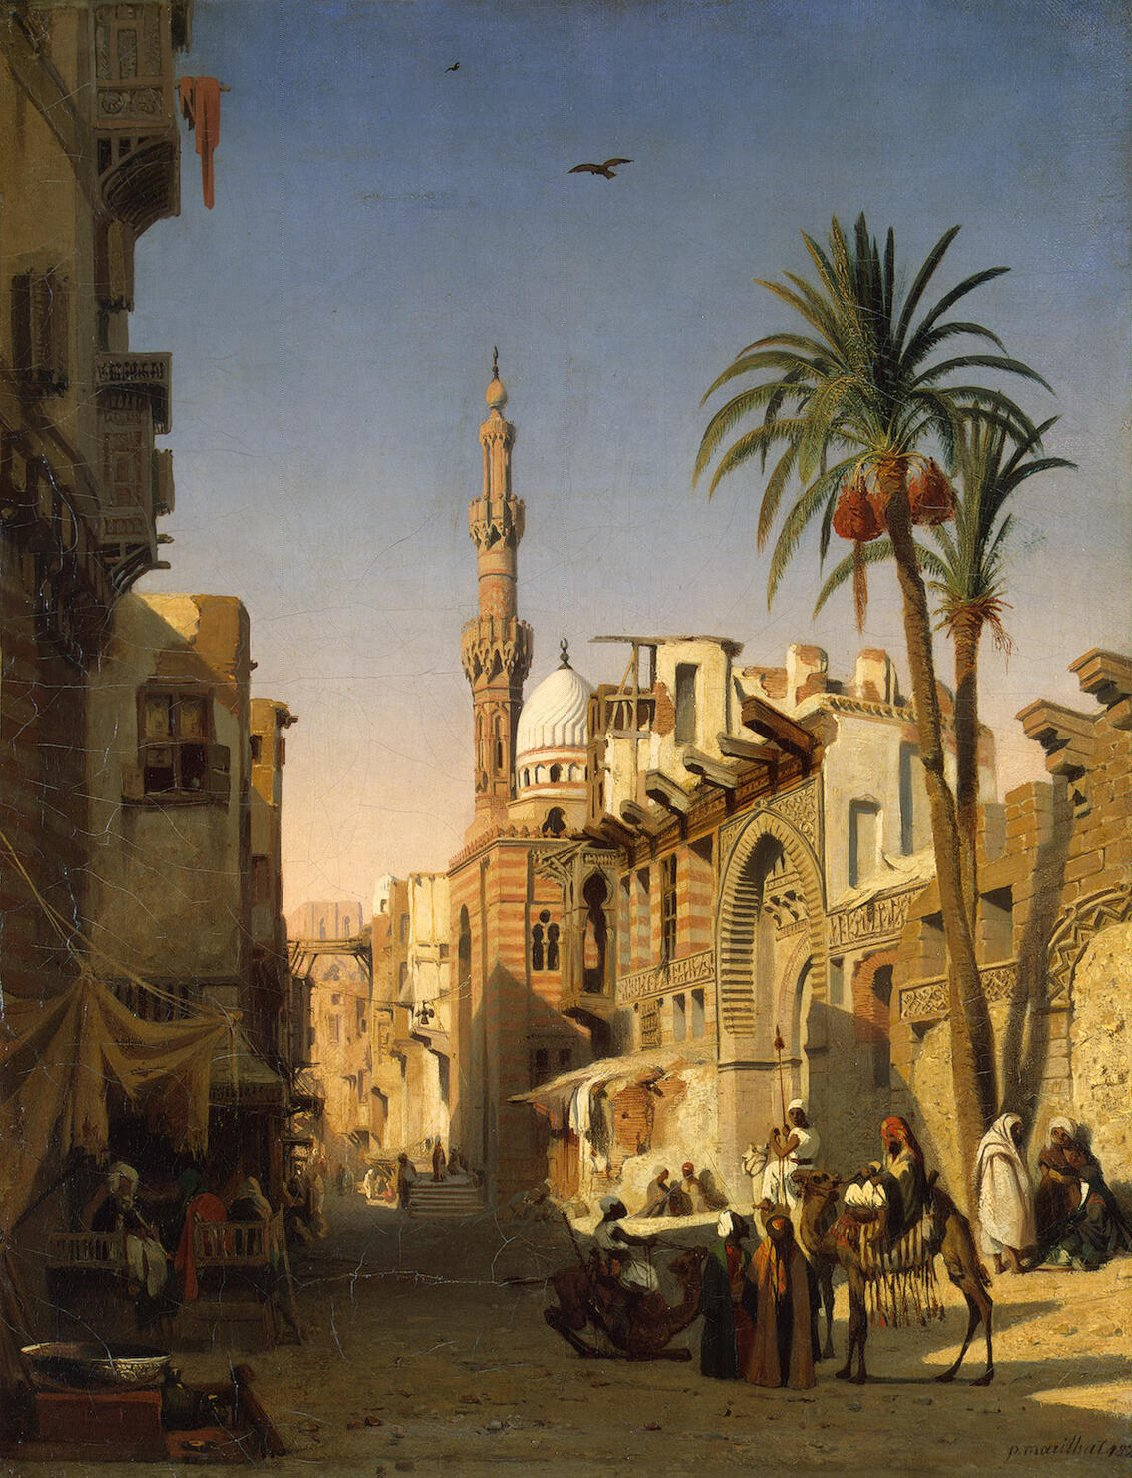 Egypt Old Cairo Paintings Prosper Georges Antoine